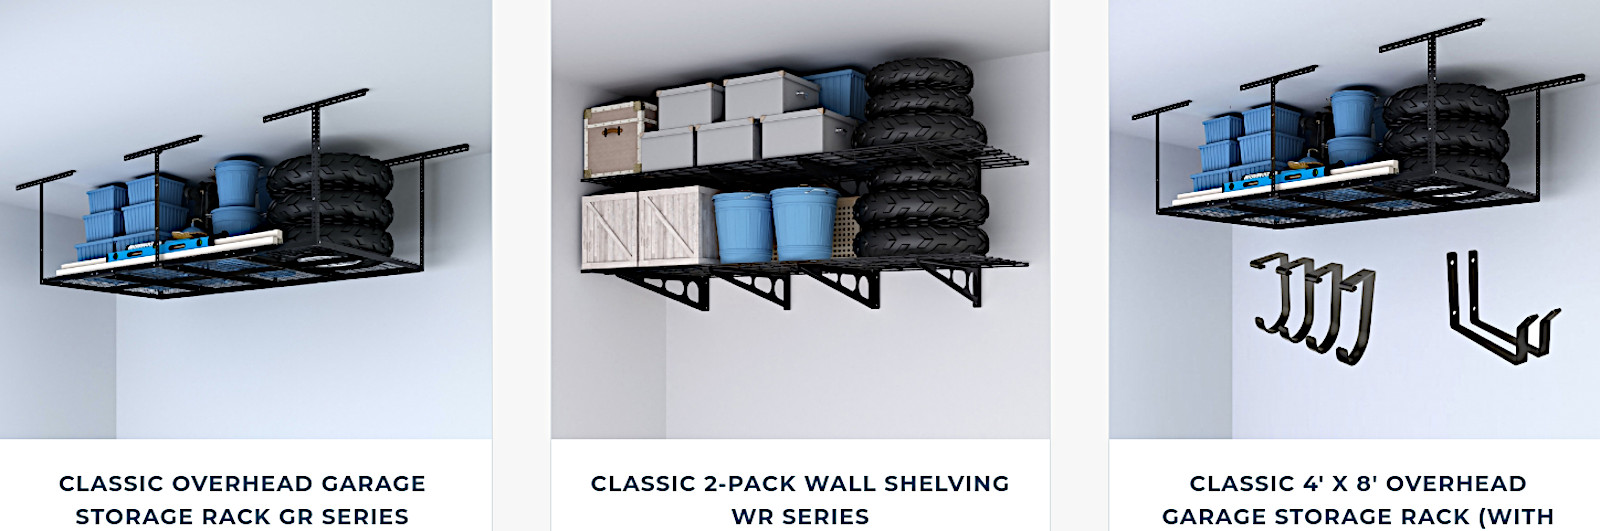 Competitive overhead garage storage racks